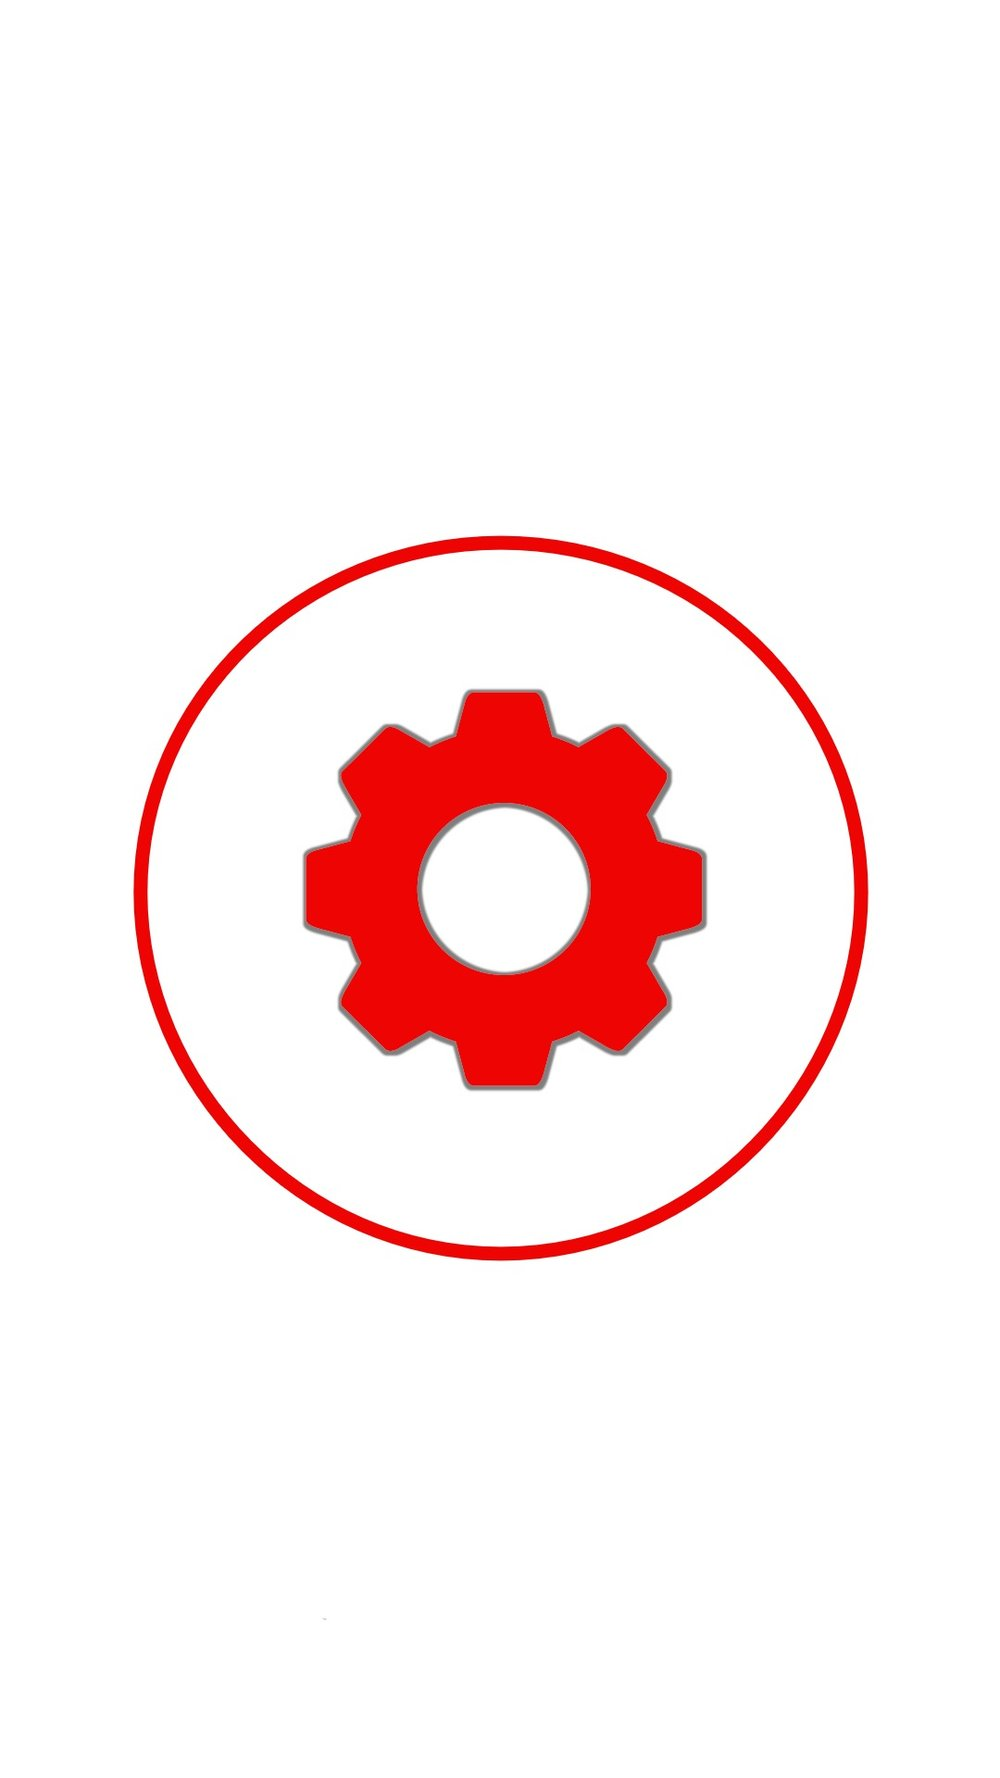 Instagram-cover-tool-red-white-lotnotes.com.jpg